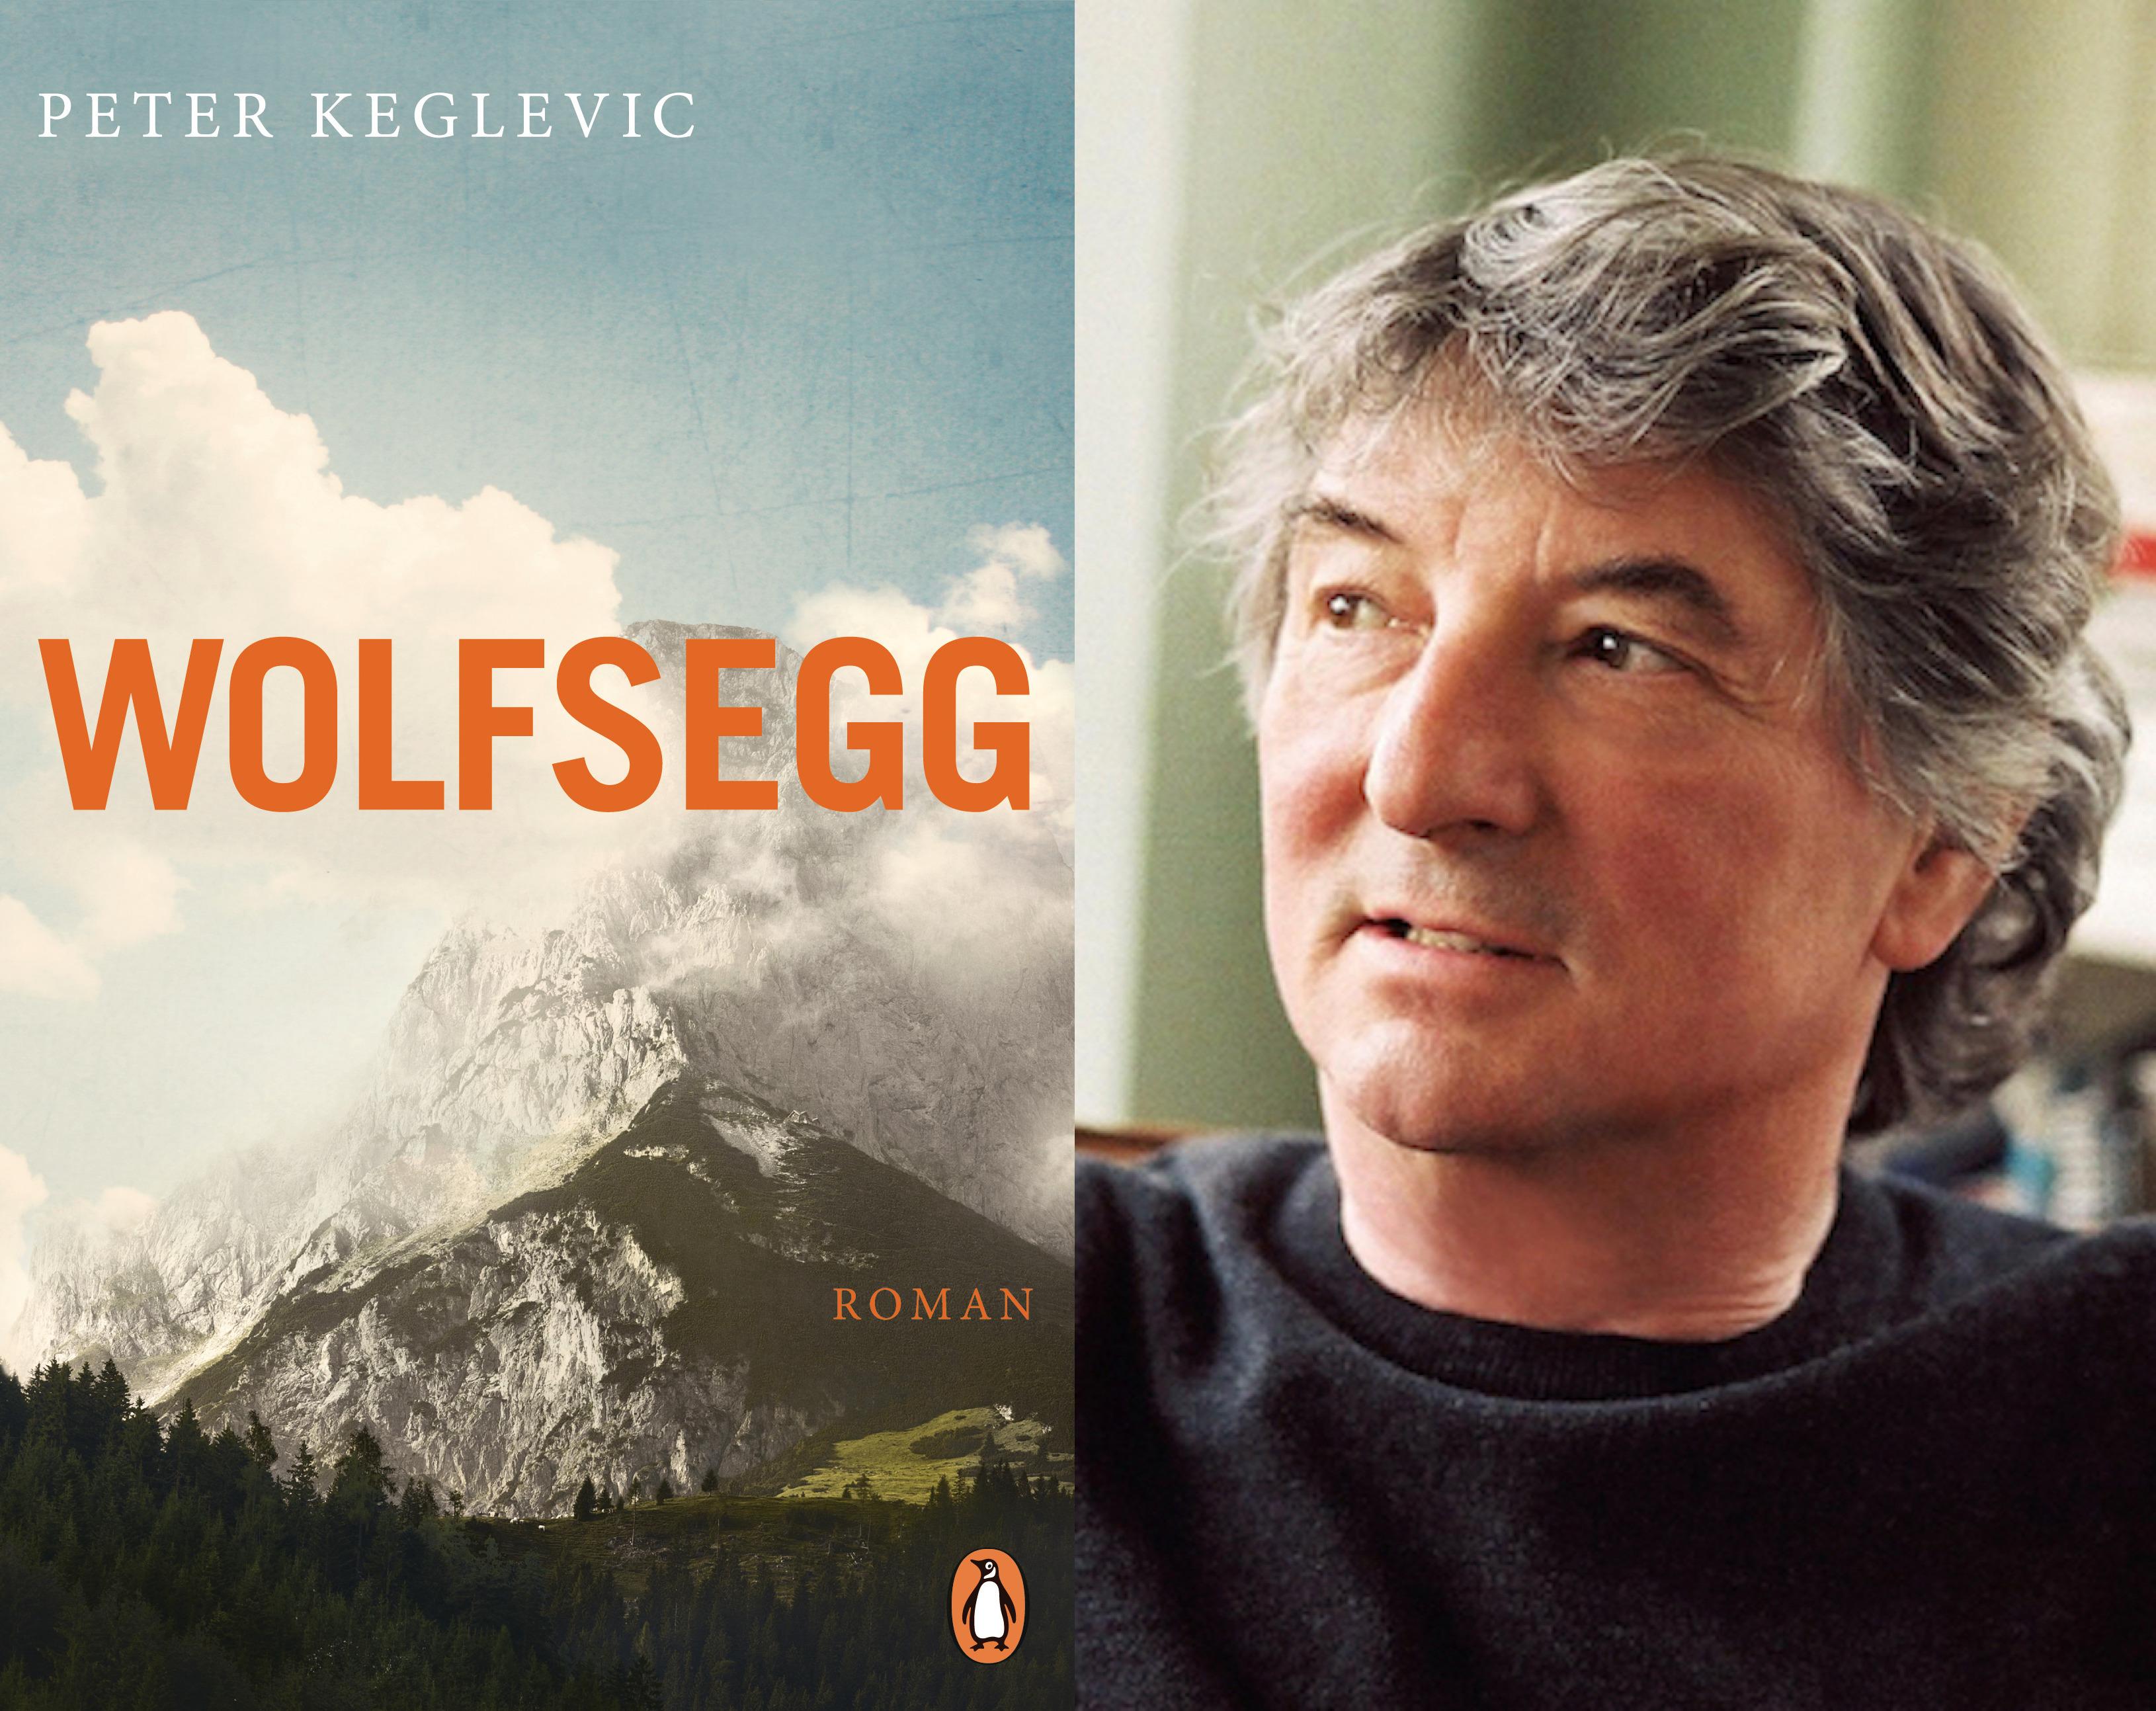 Peter Keglevics neuer Roman WOLFSEGG